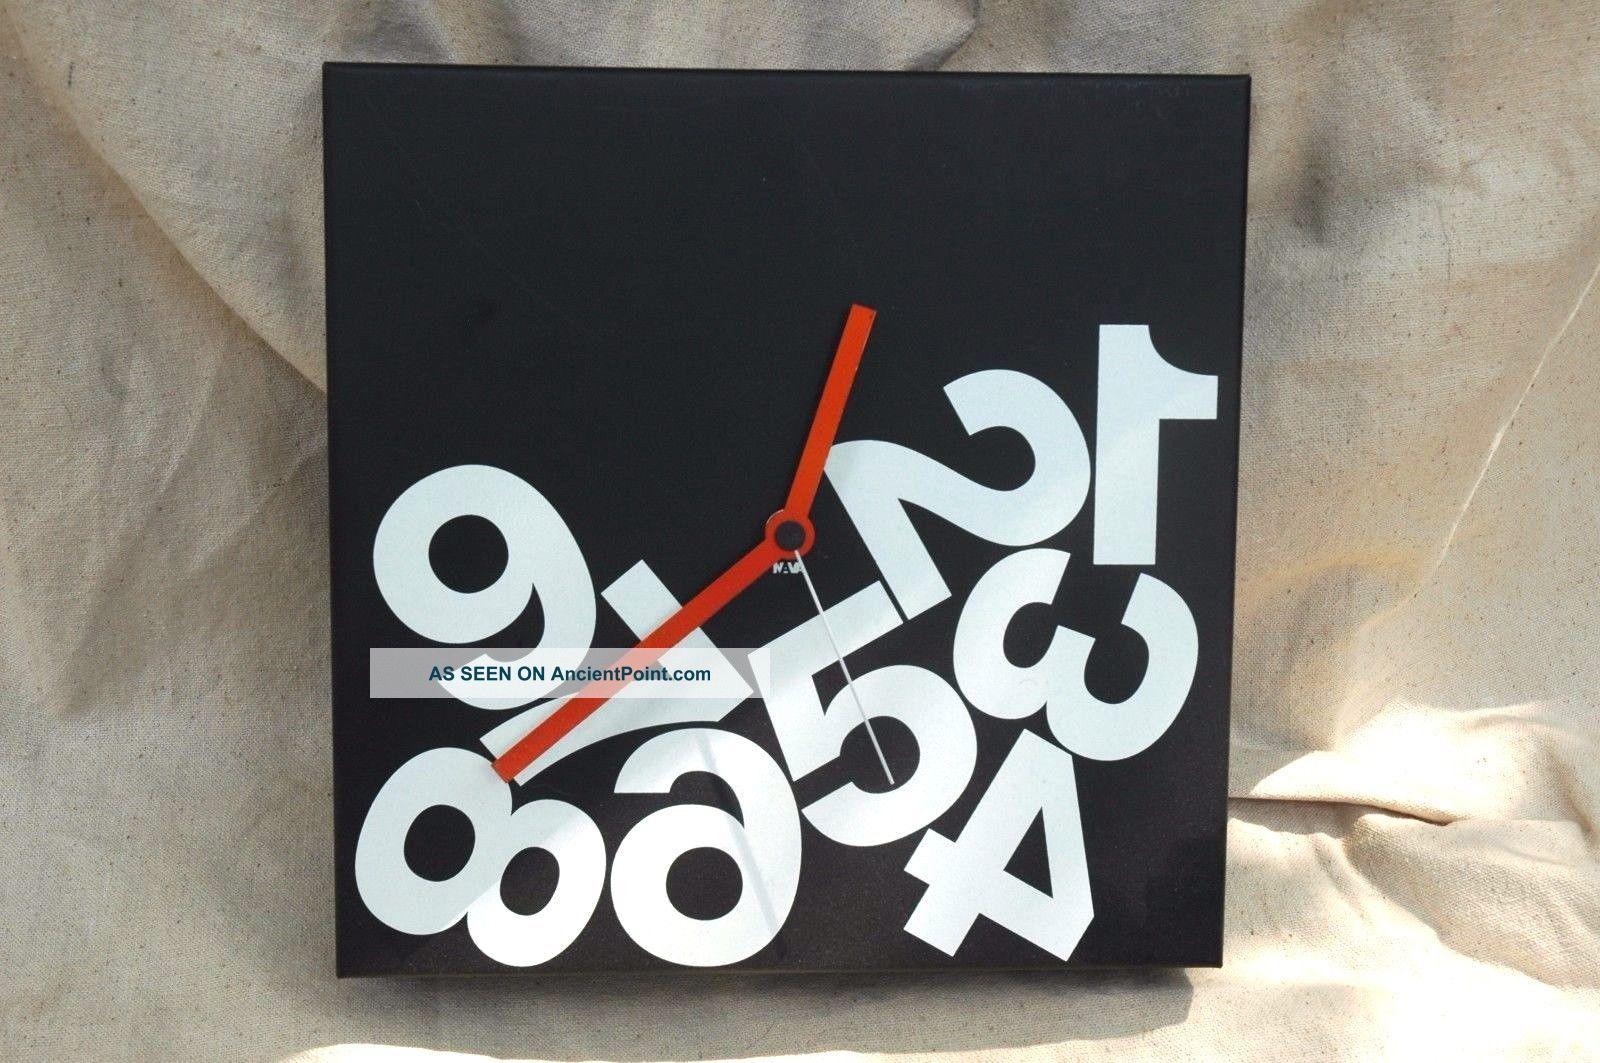 Moma Store Nava Milano Design Times Square Cube Wall Clock By Dario Serio Modern Mid-Century Modernism photo